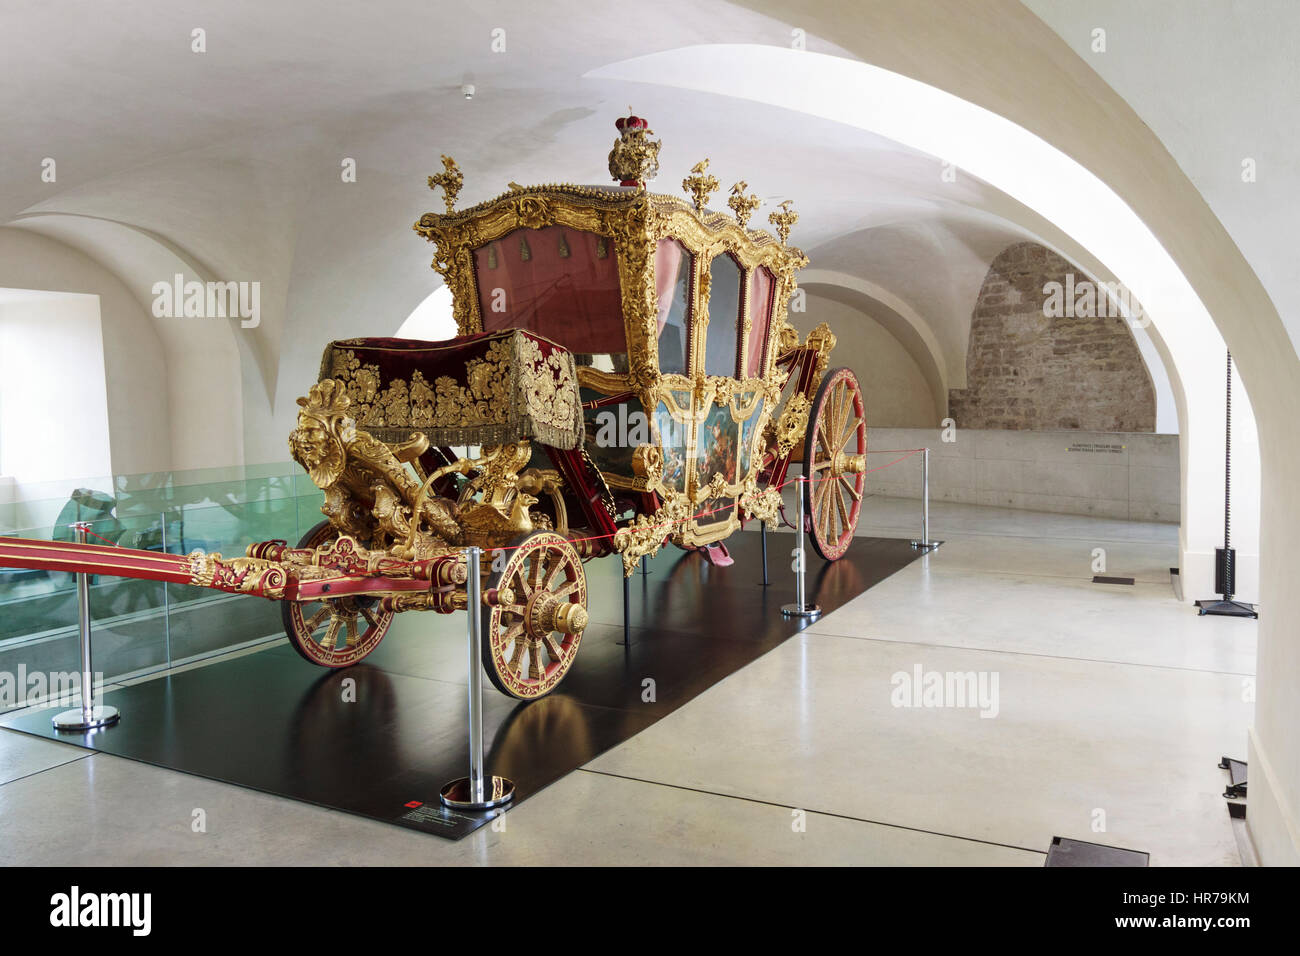 18th century Troyer Coach at Premysl Palace Archdiocesan Museum, Olomouc, Moravia, Czech Republic Stock Photo